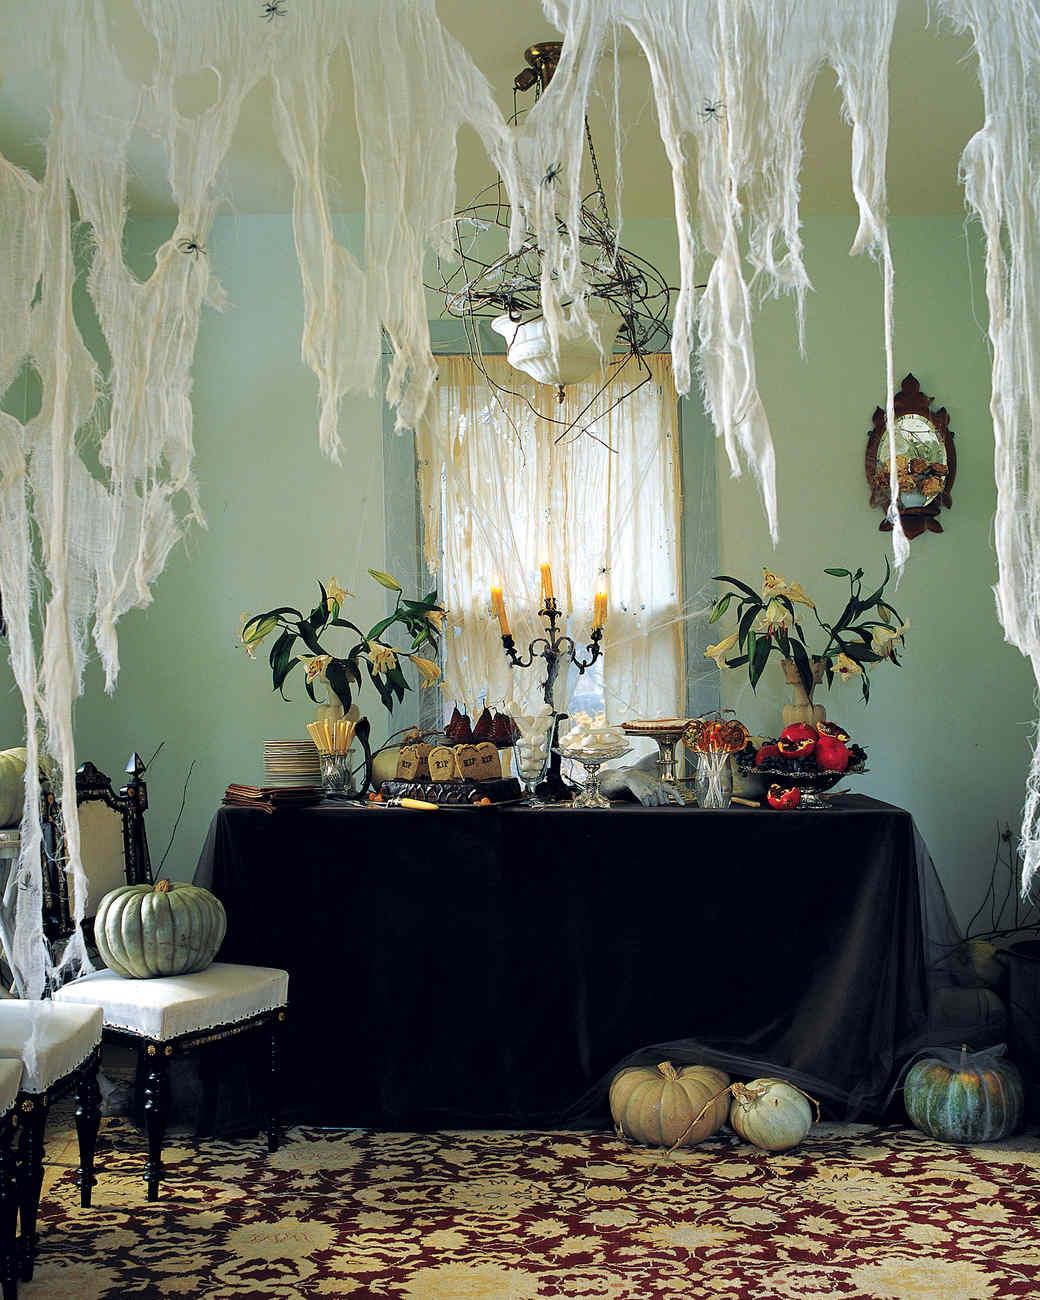 Help Me Decorate My Living Room Online Converting Bedroom To Bat Open Living Room Best Site Martha Stewart